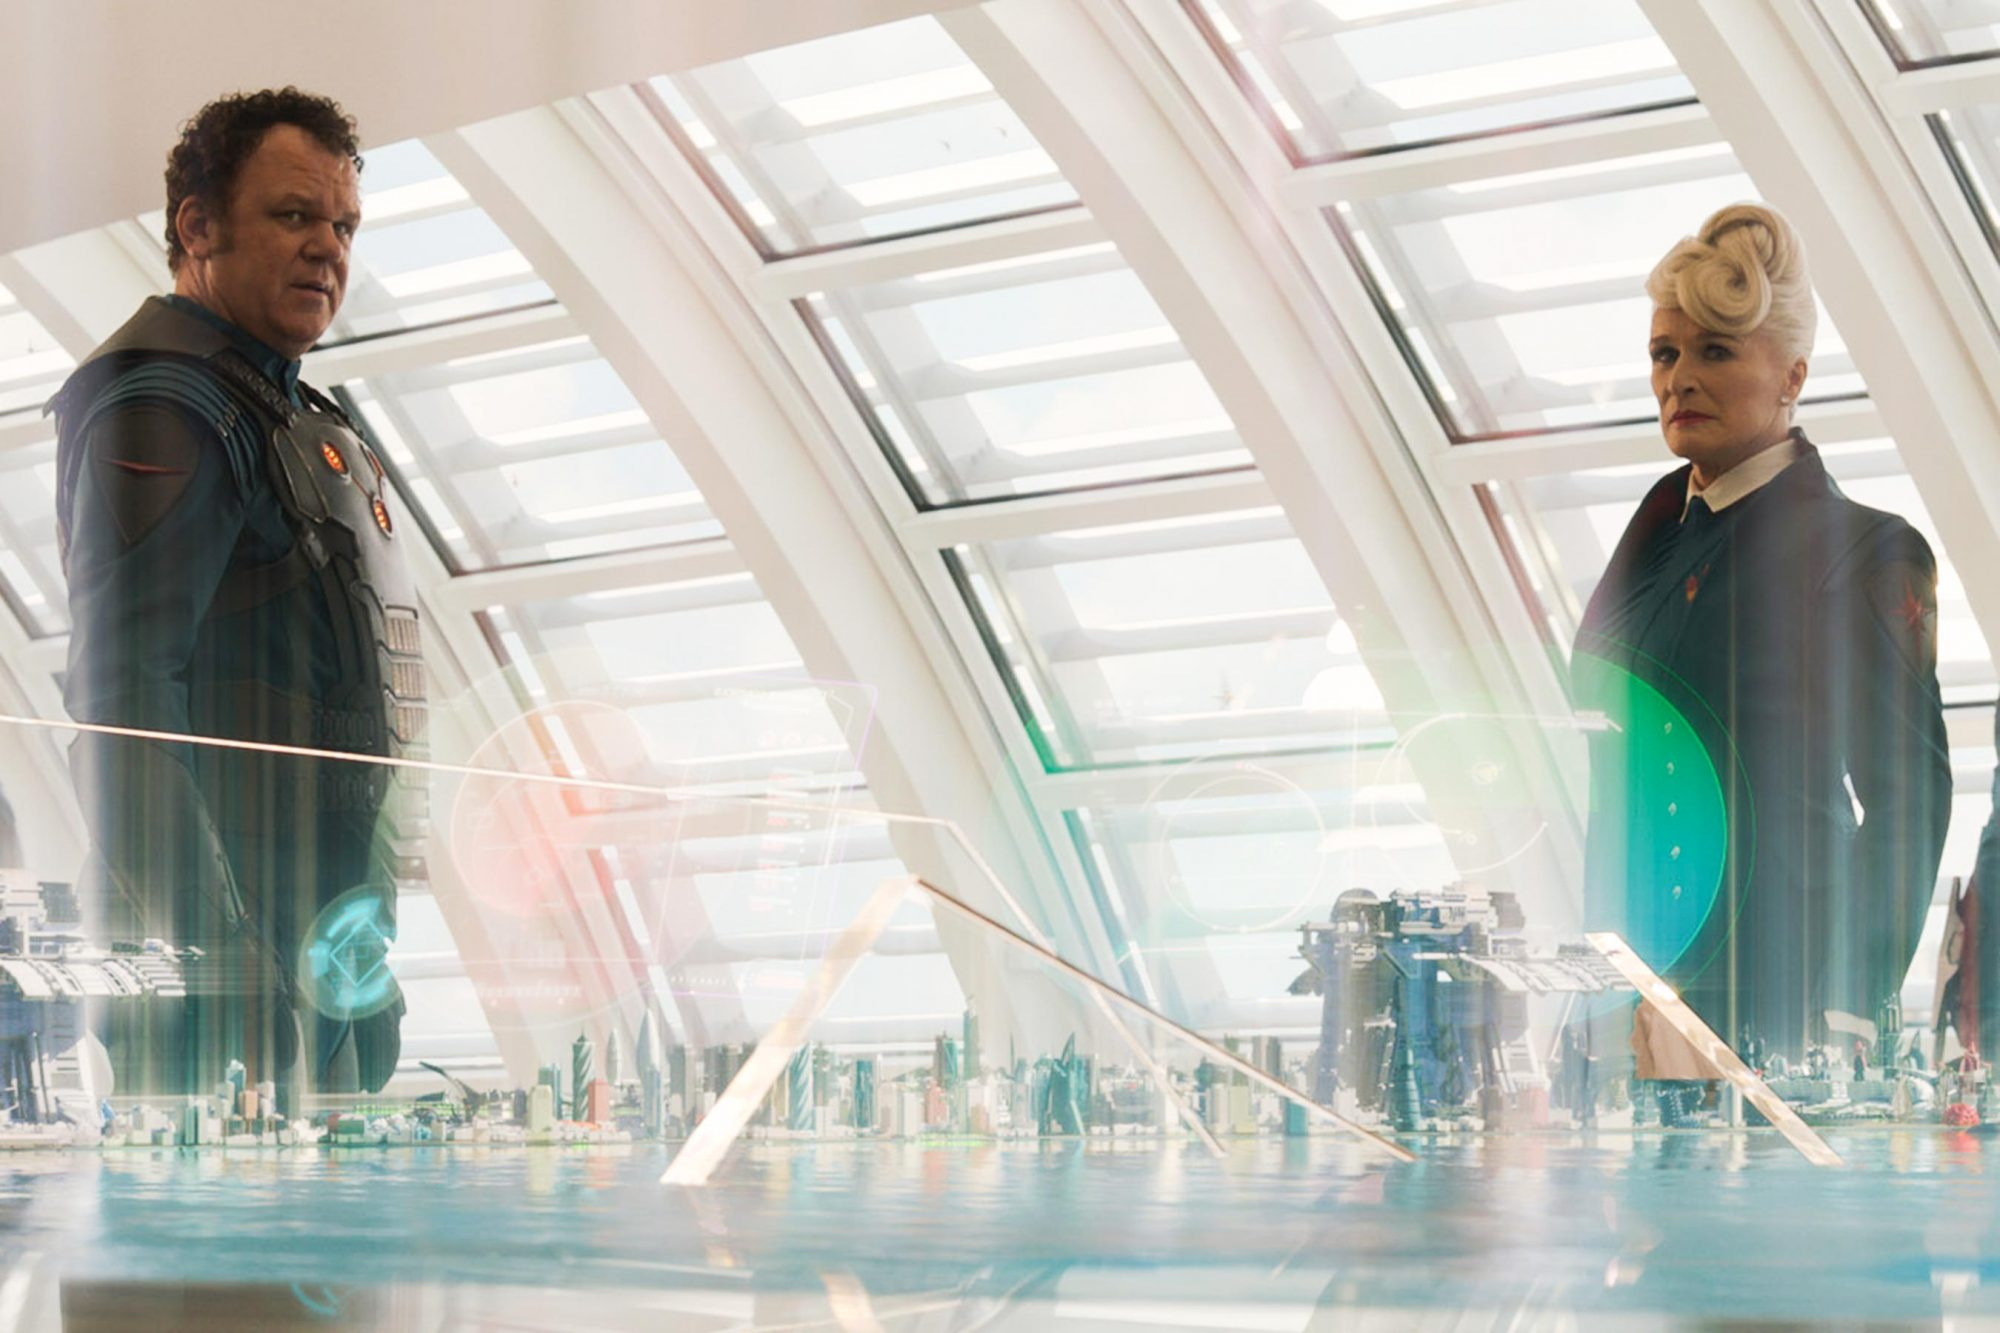 GUARDIANS OF THE GALAXY, John C. Reilly (left), Glenn Close (white hair), 2014. ©Walt Disney